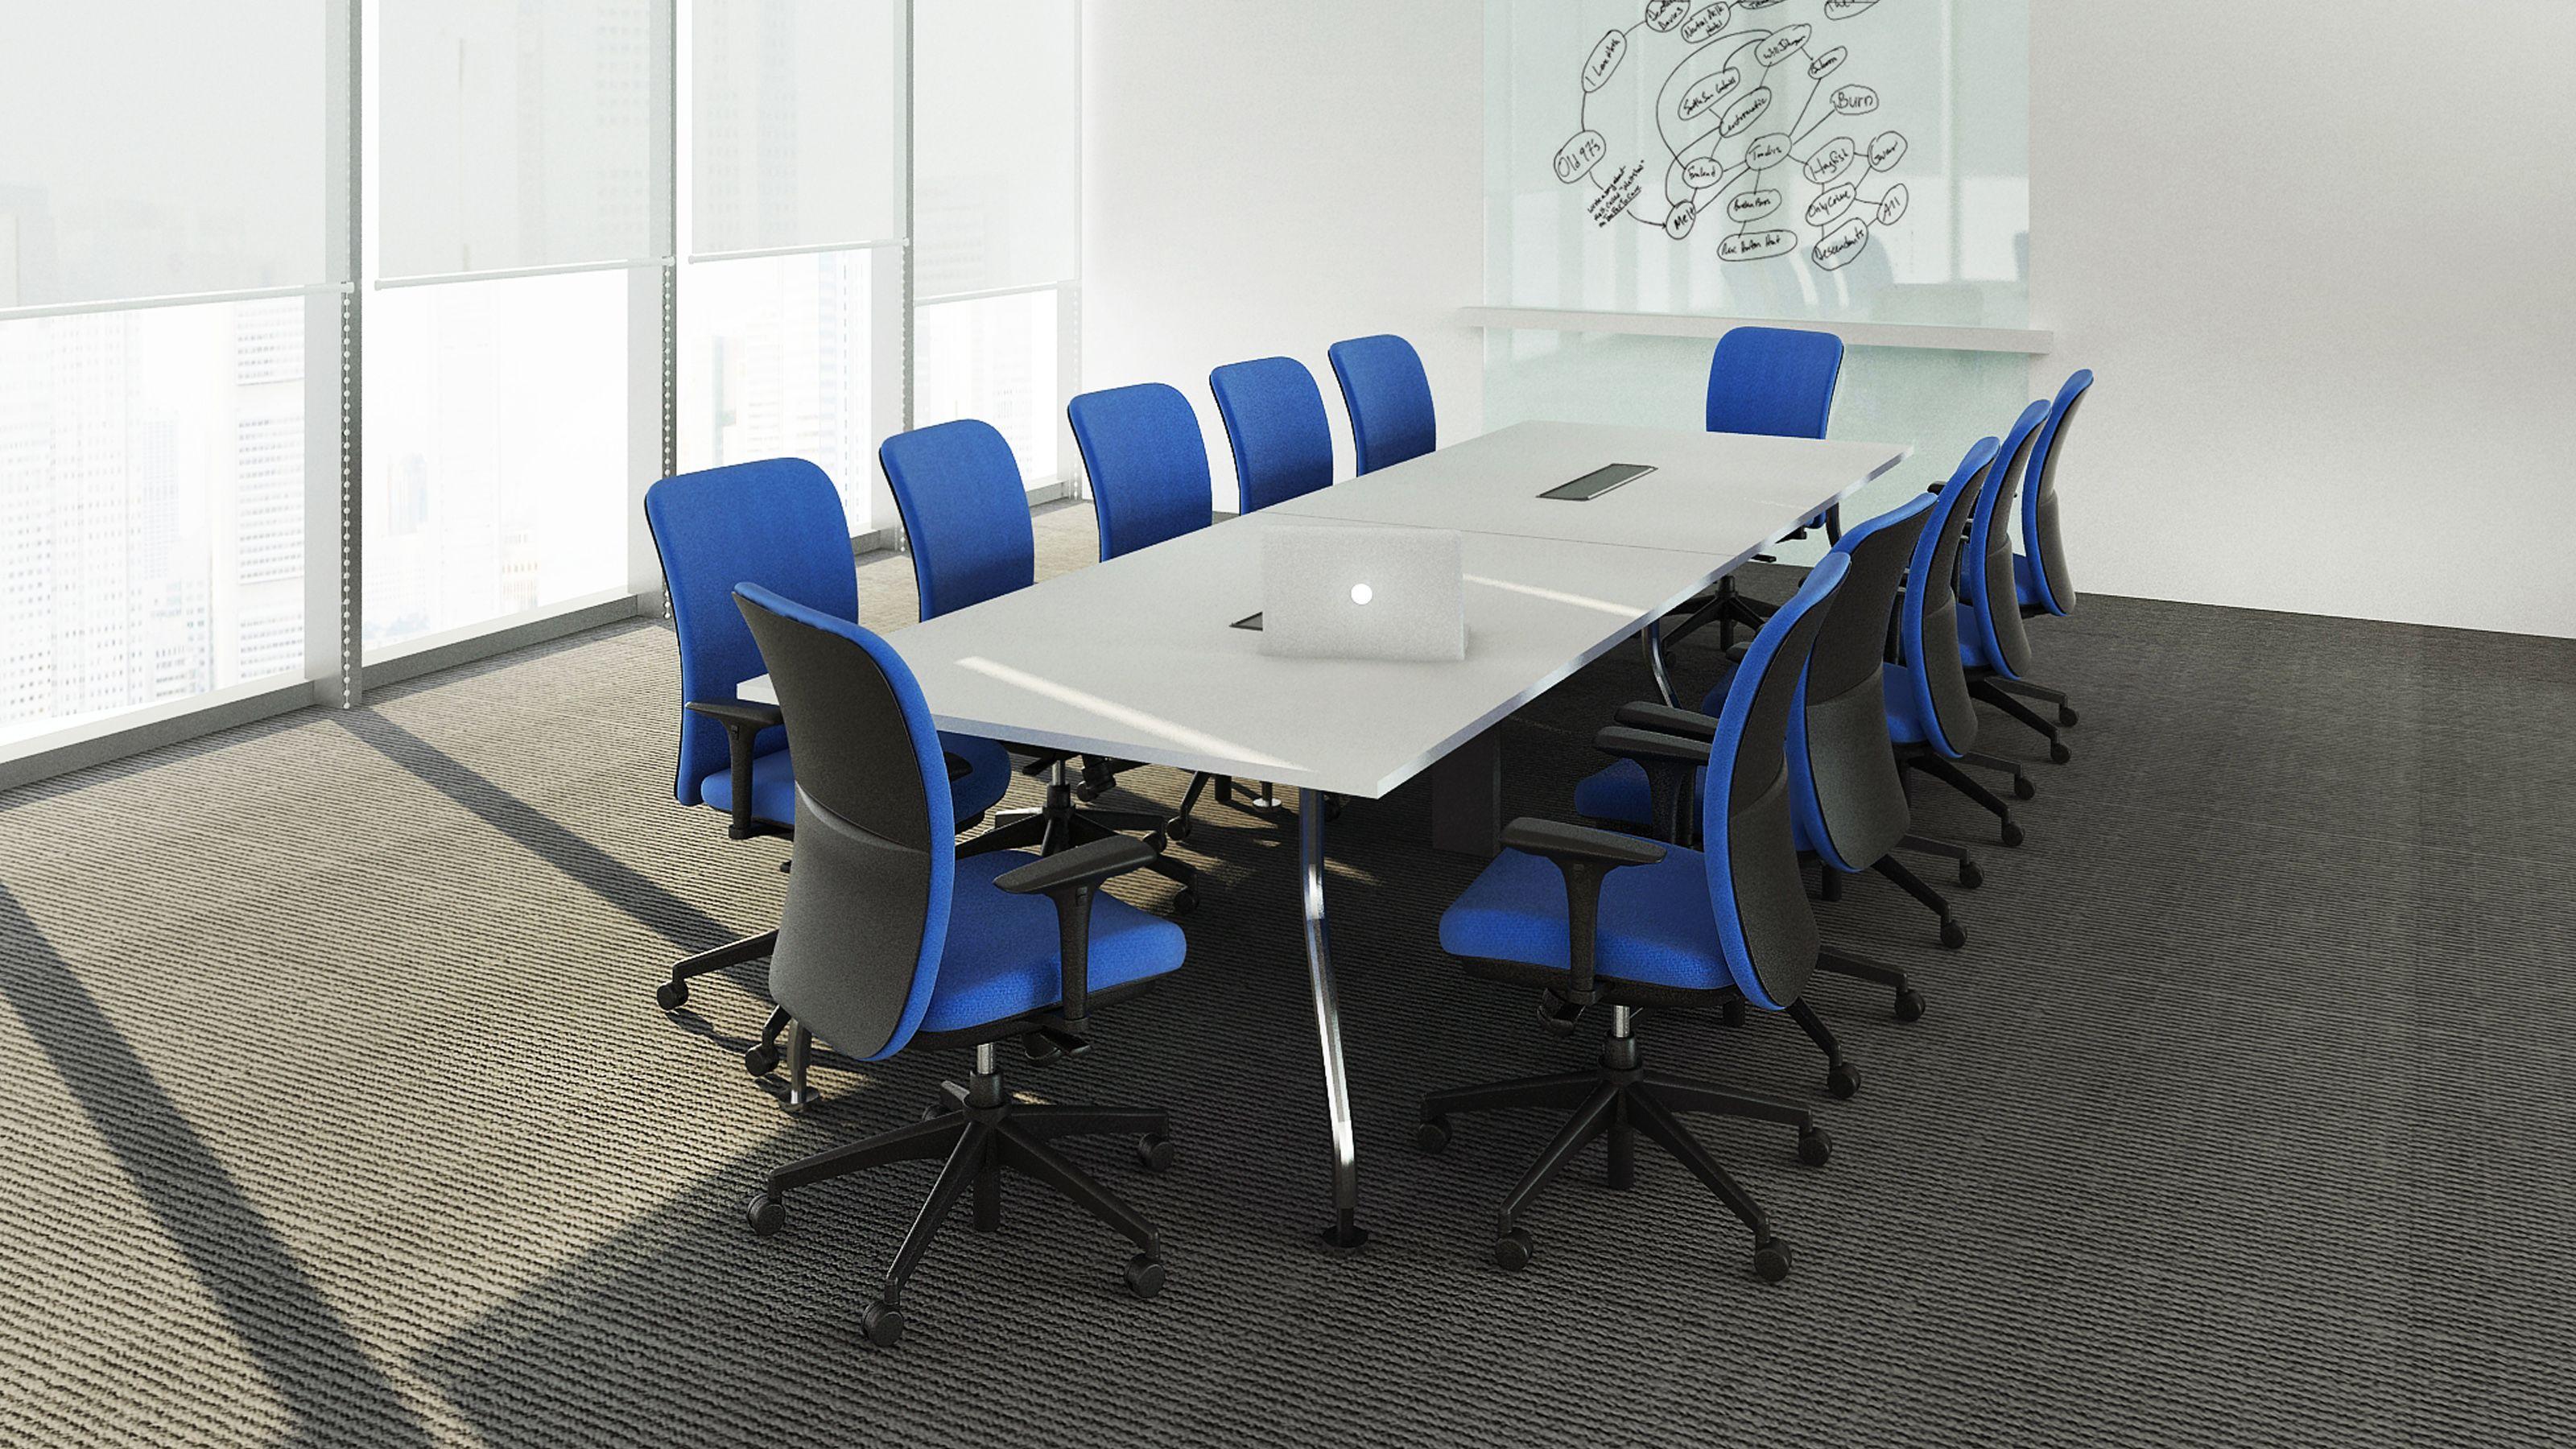 1+1 Organization Tools | Home decor, Furniture, Ortho office